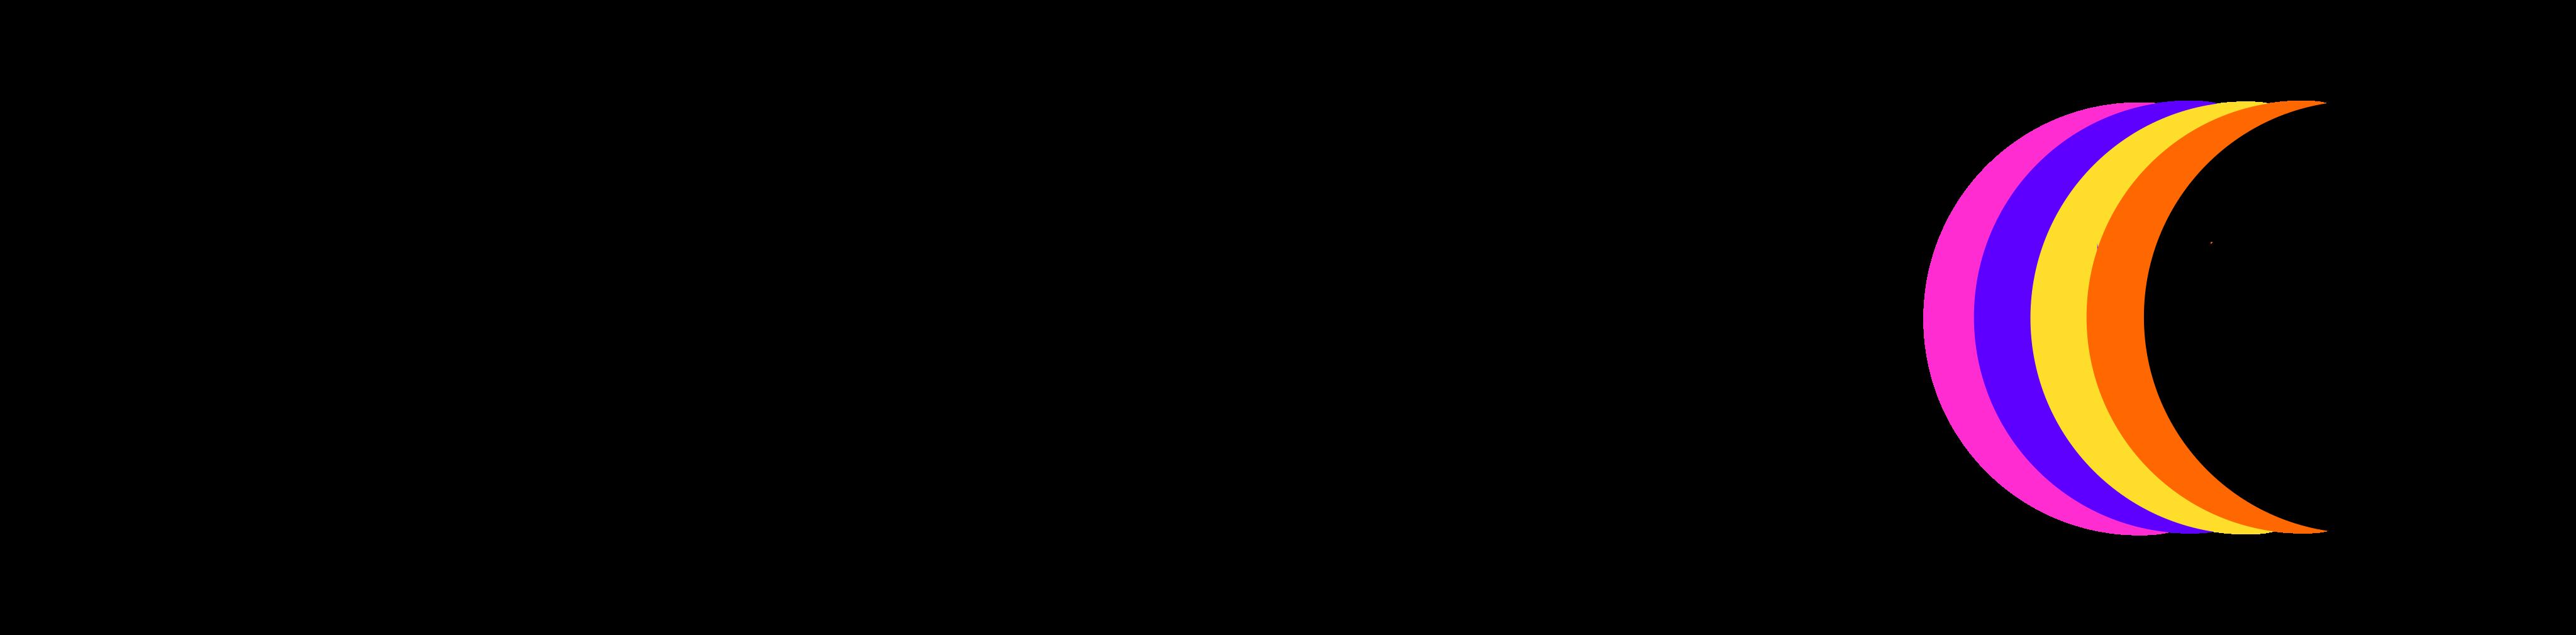 pluto tv logo - Pluto TV Logo